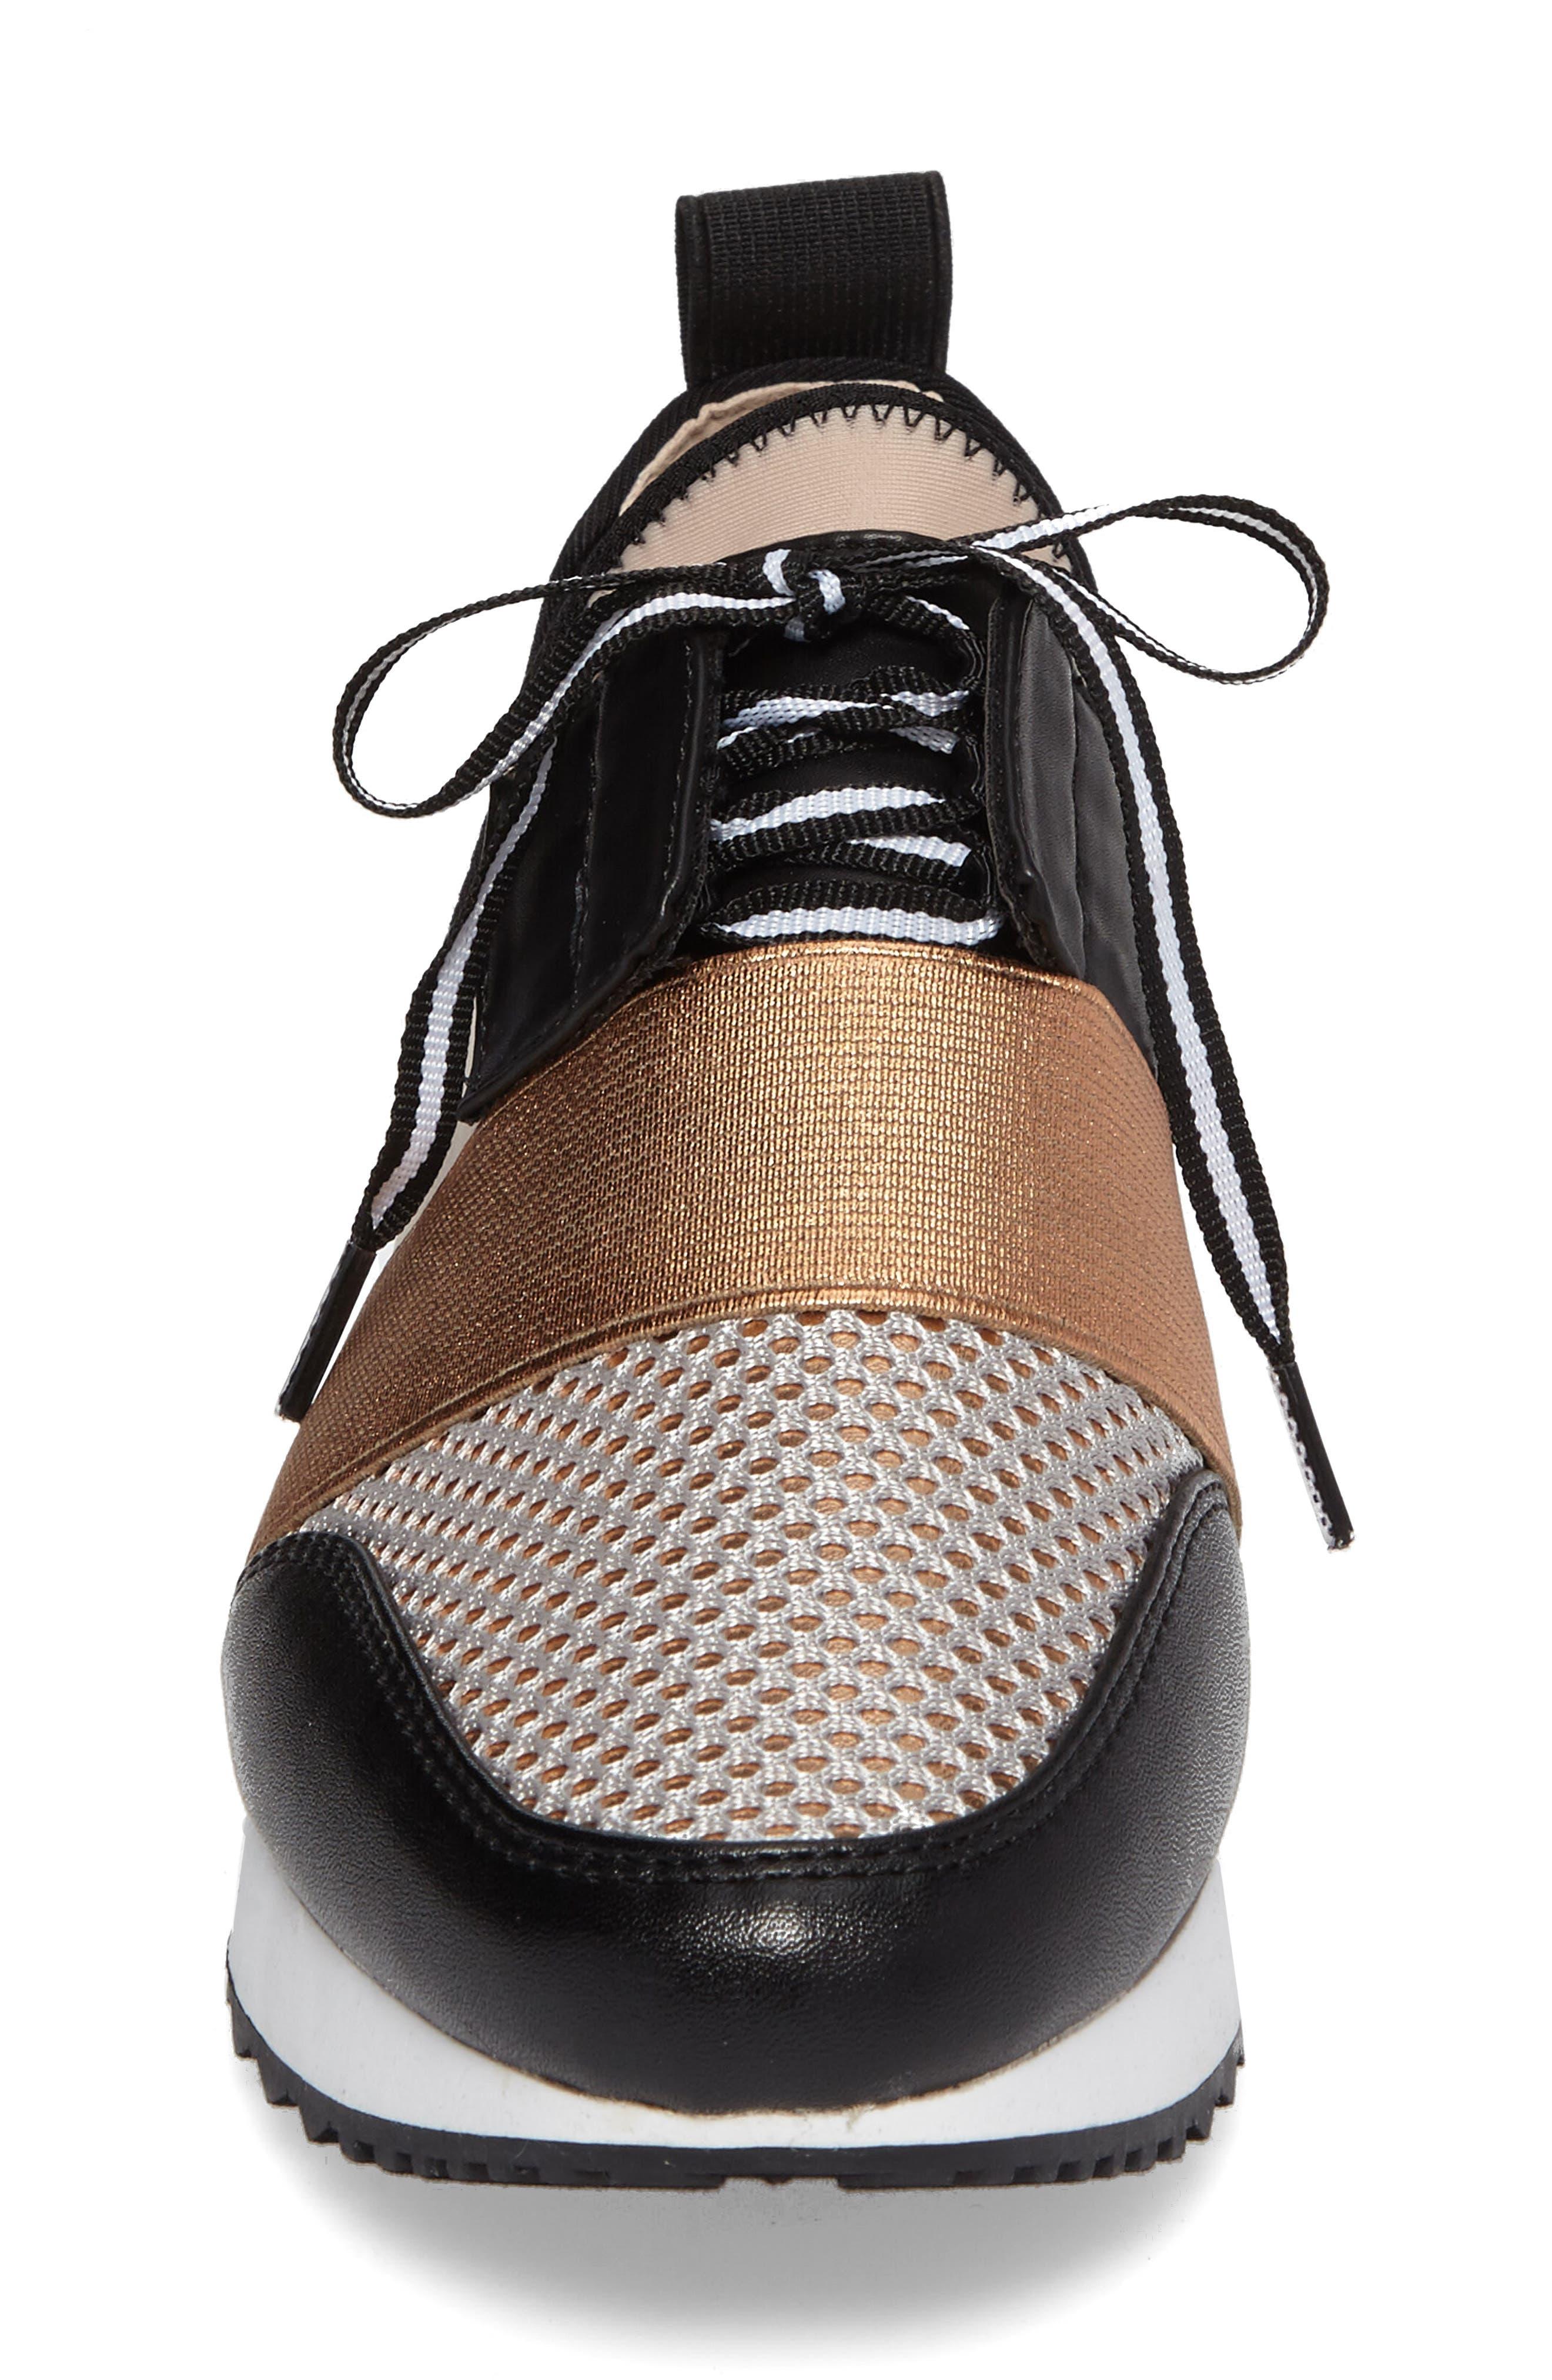 Antics Sneaker,                             Alternate thumbnail 4, color,                             Rose Gold Faux Leather